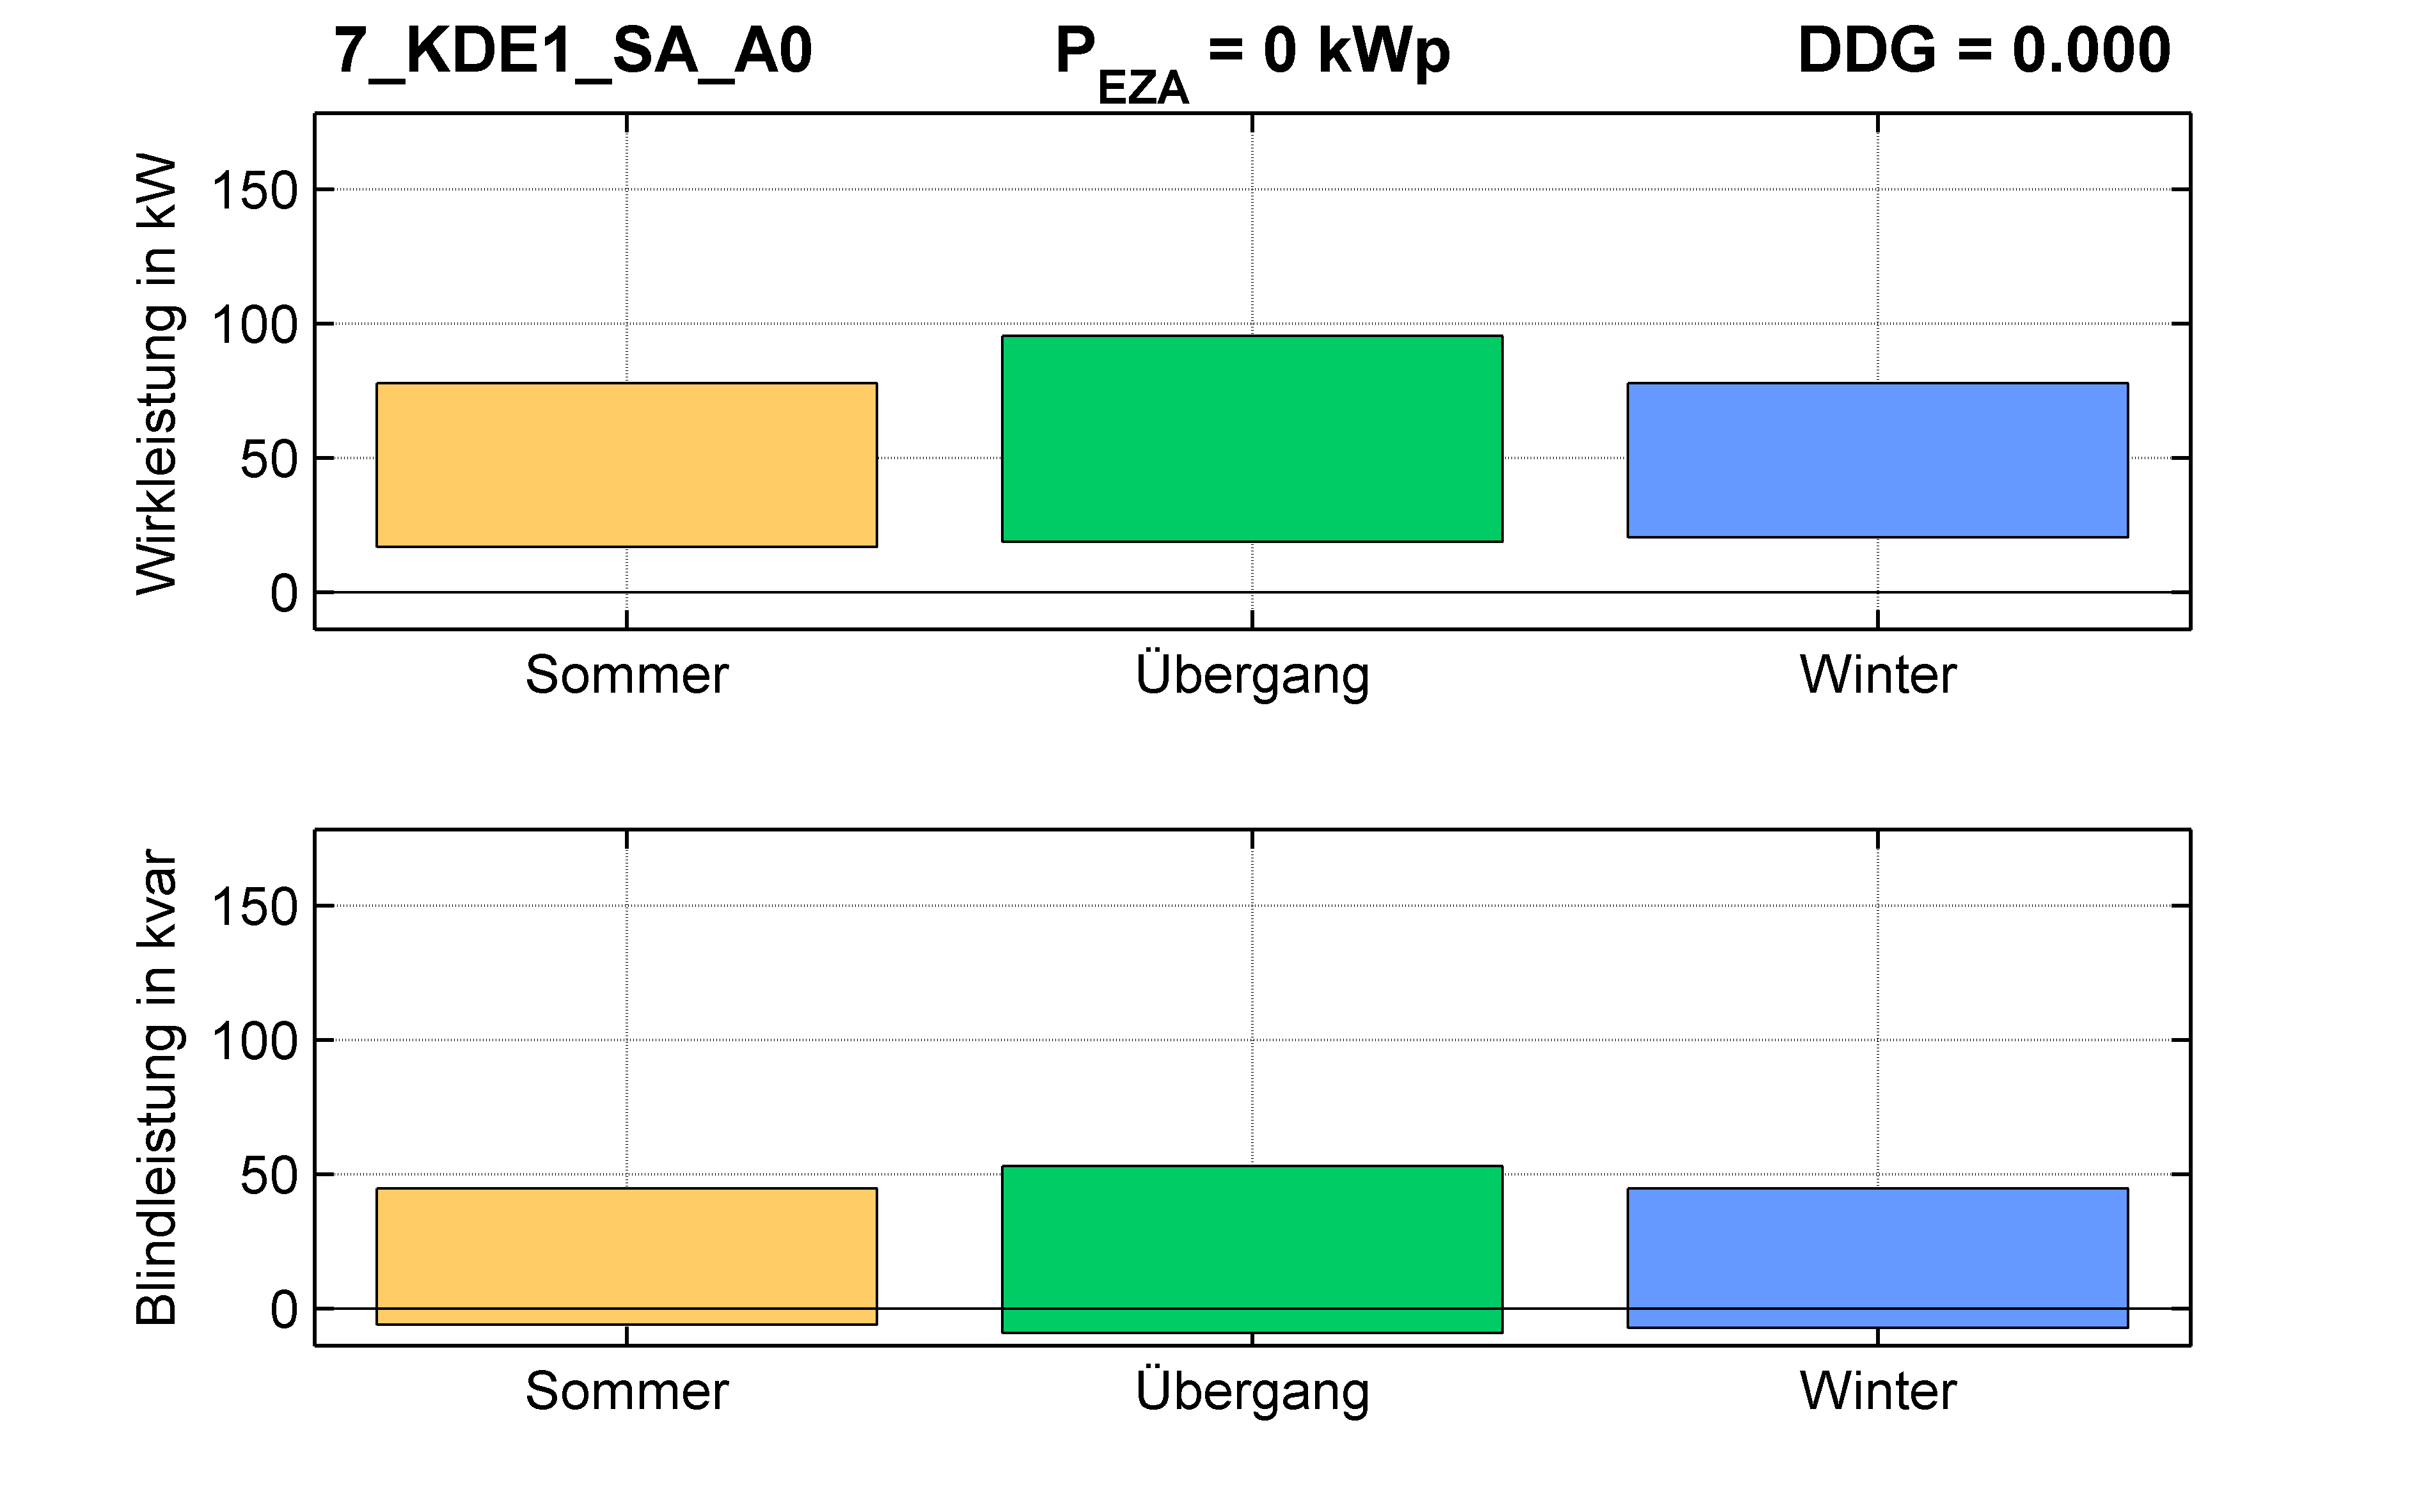 KDE1 | Längsregler (SA) A0 | PQ-Bilanz